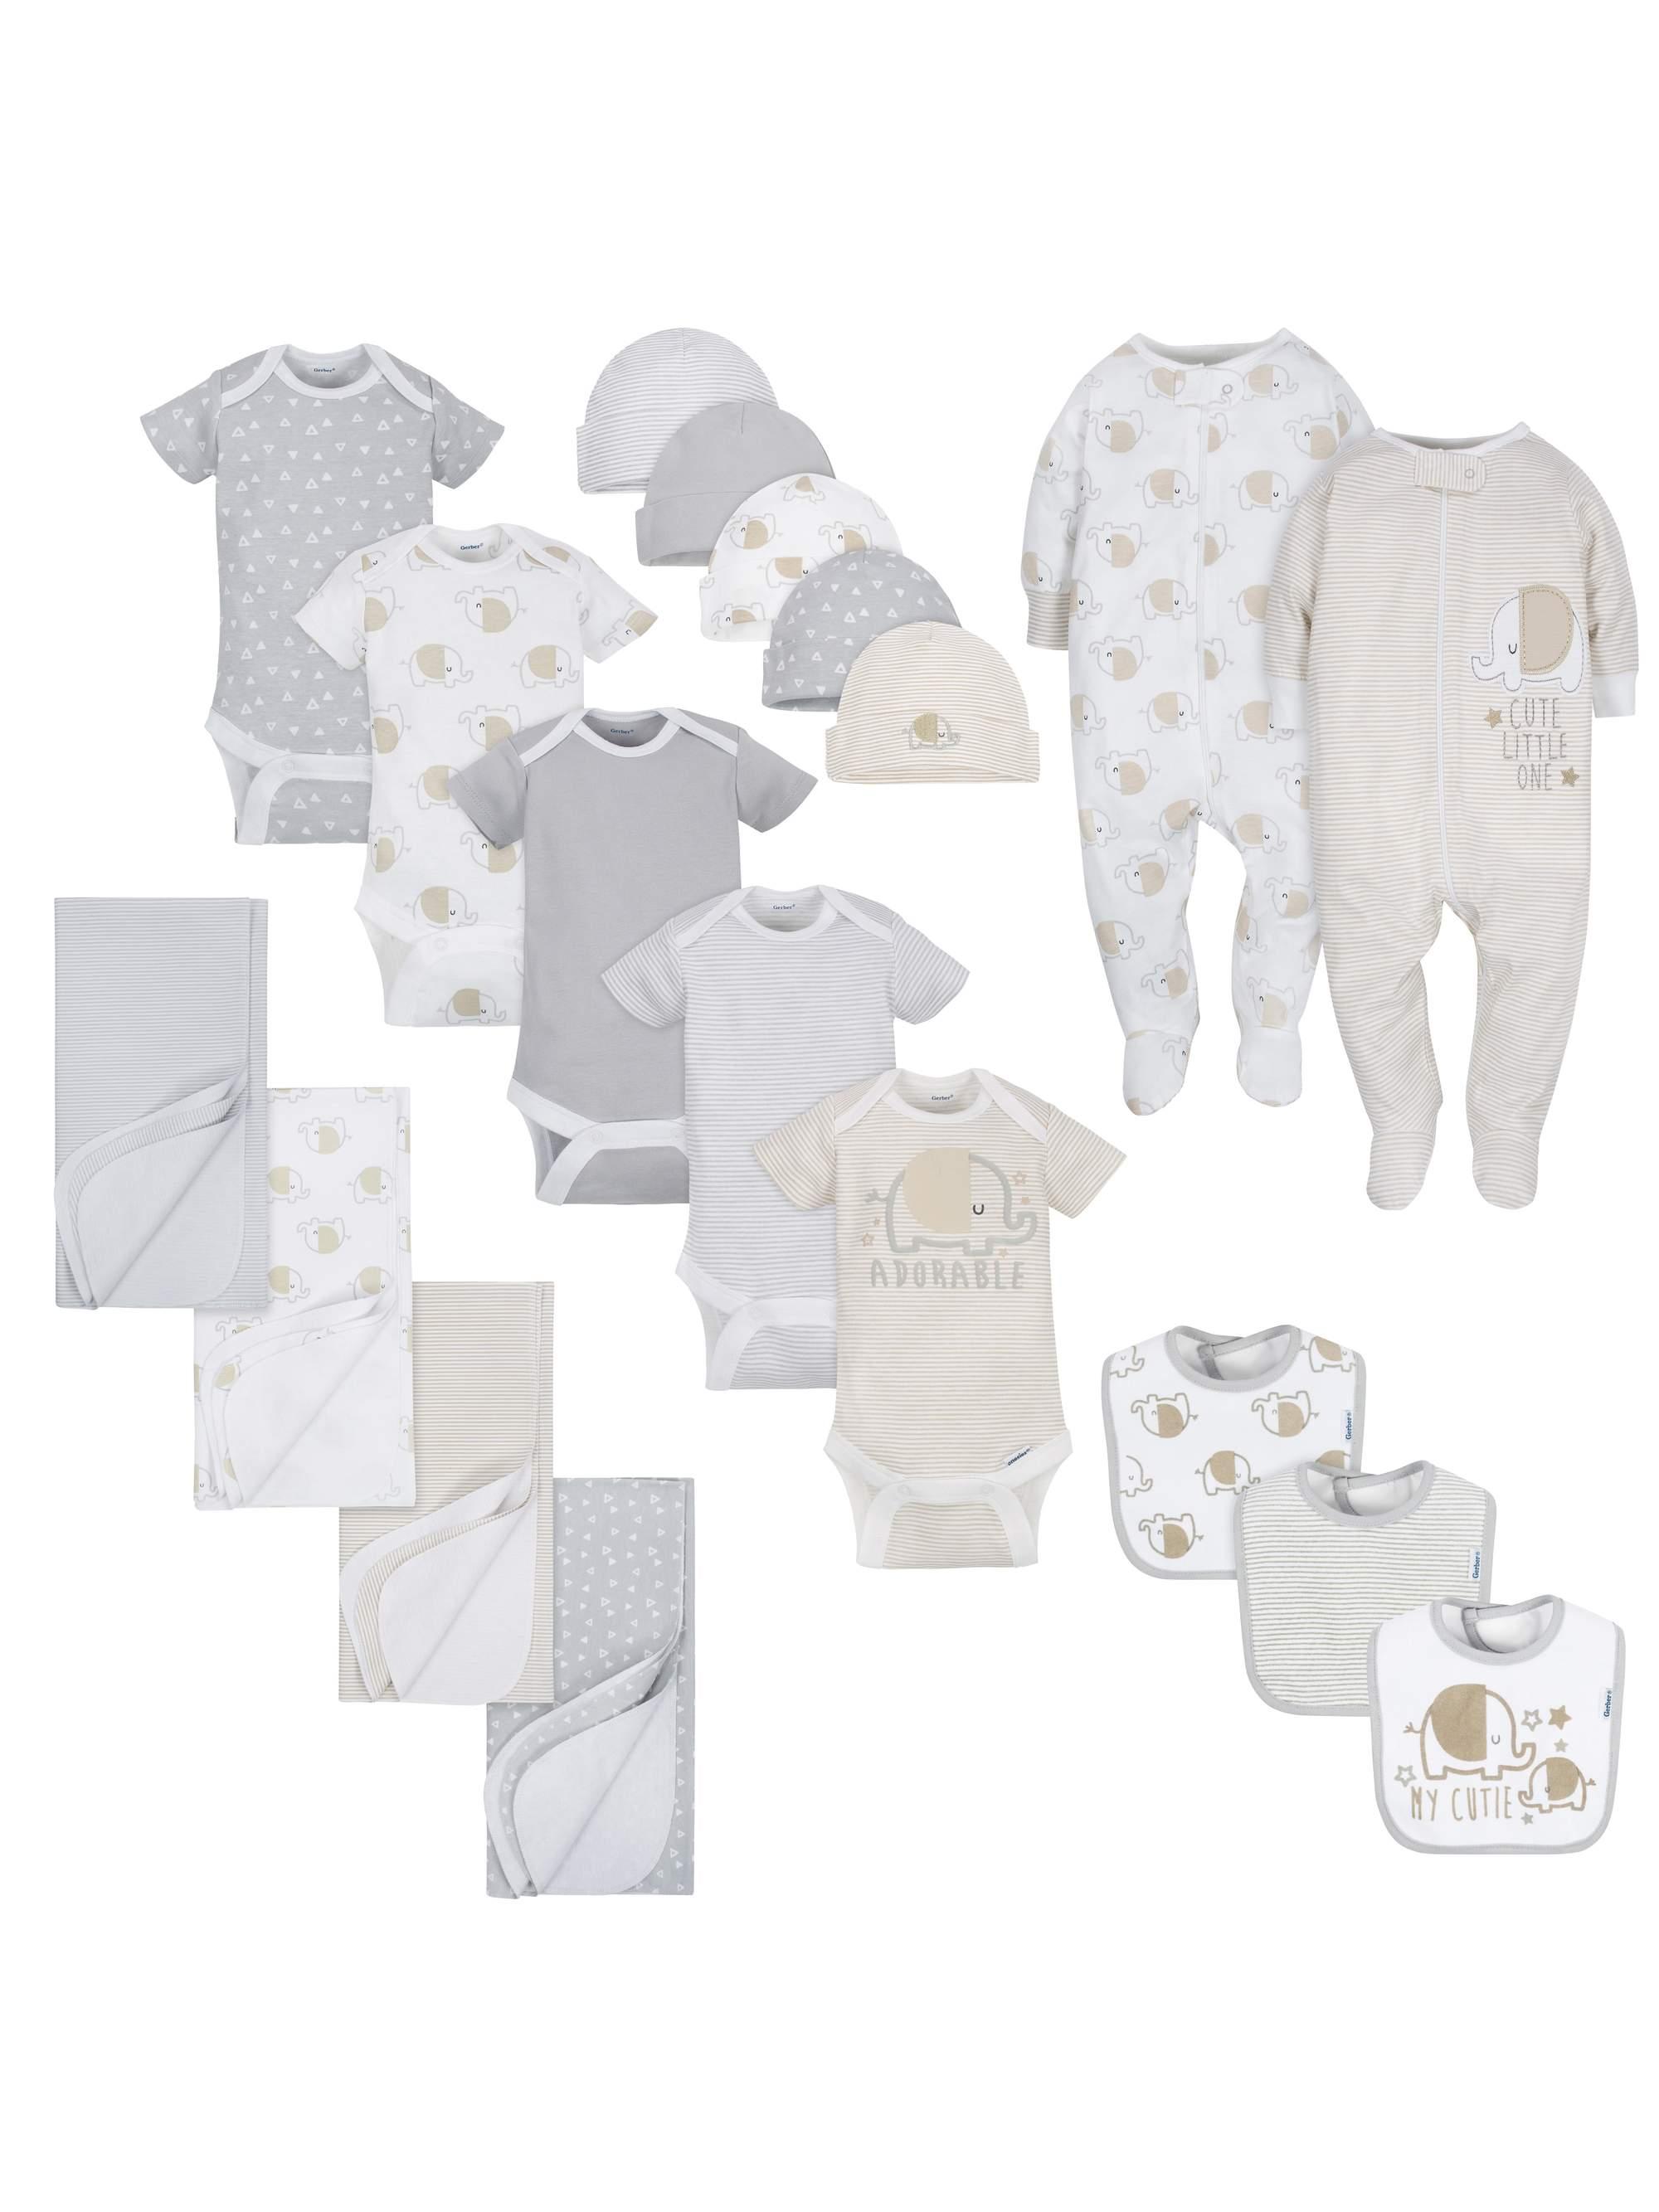 Layette Essentials Baby Shower Gift Set, 19pc (Baby Boy or Baby Girl Unisex)